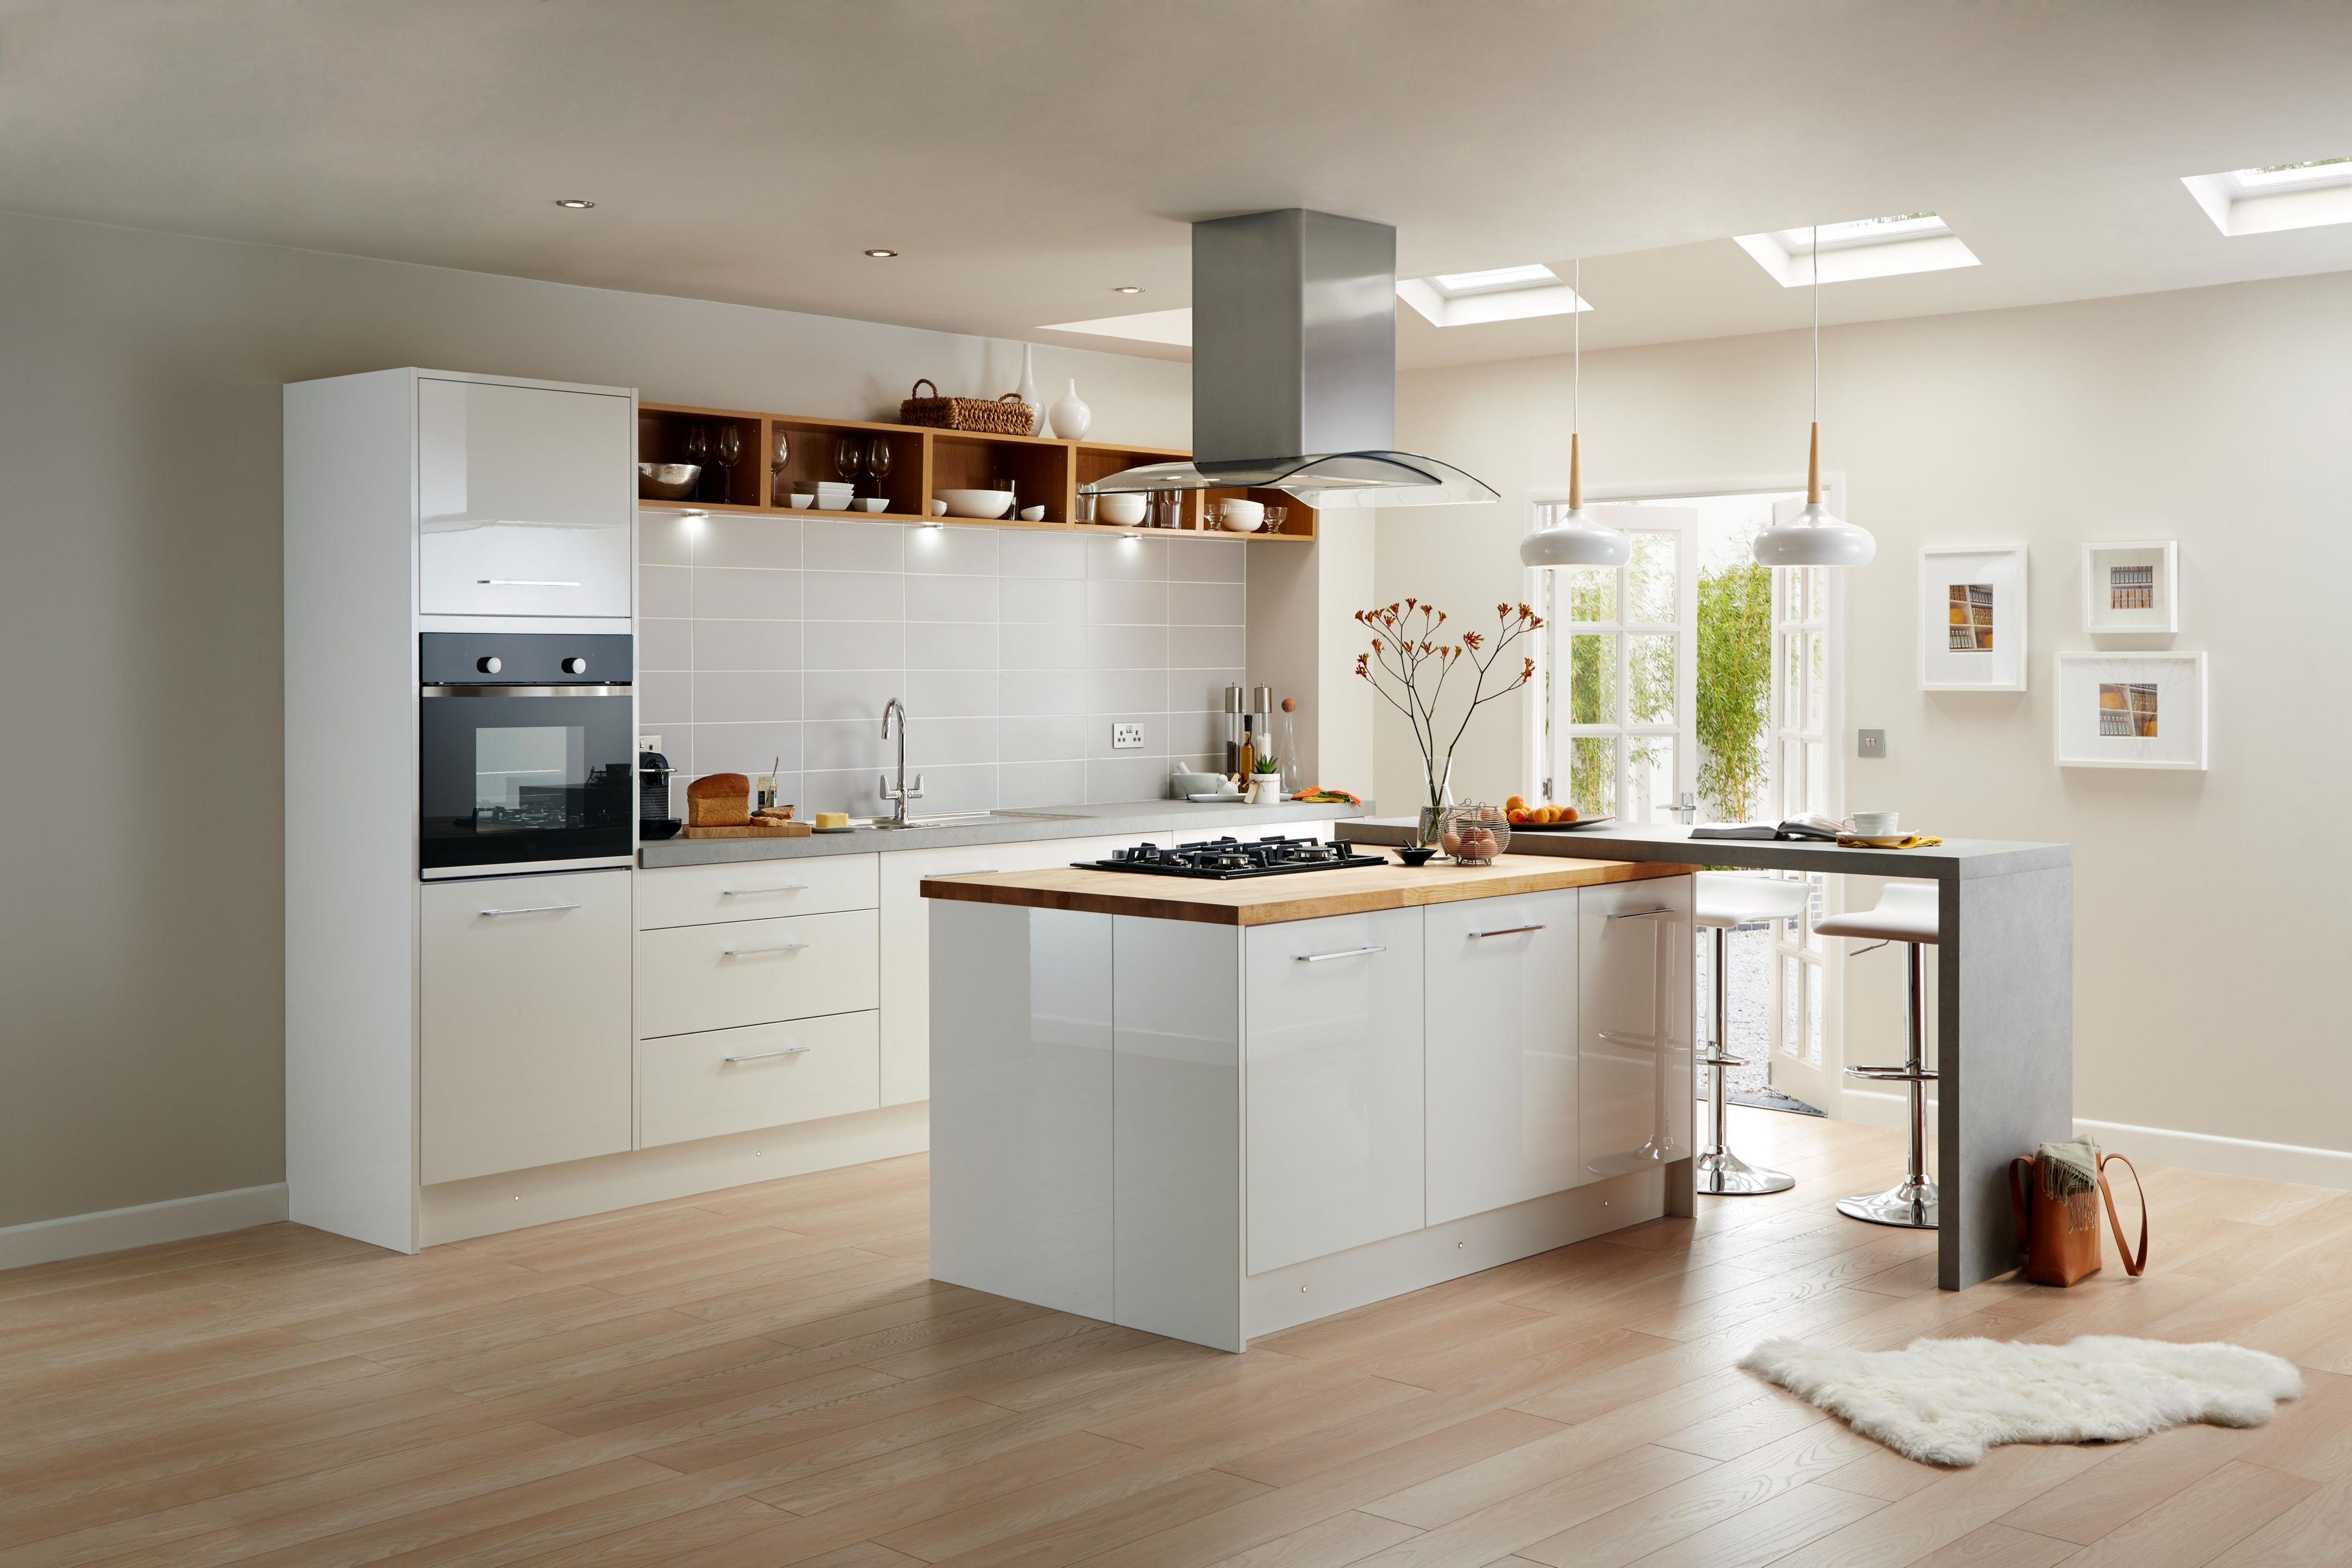 High gloss kitchens cooke u0026 lewis raffello high gloss white slab COUKTVD